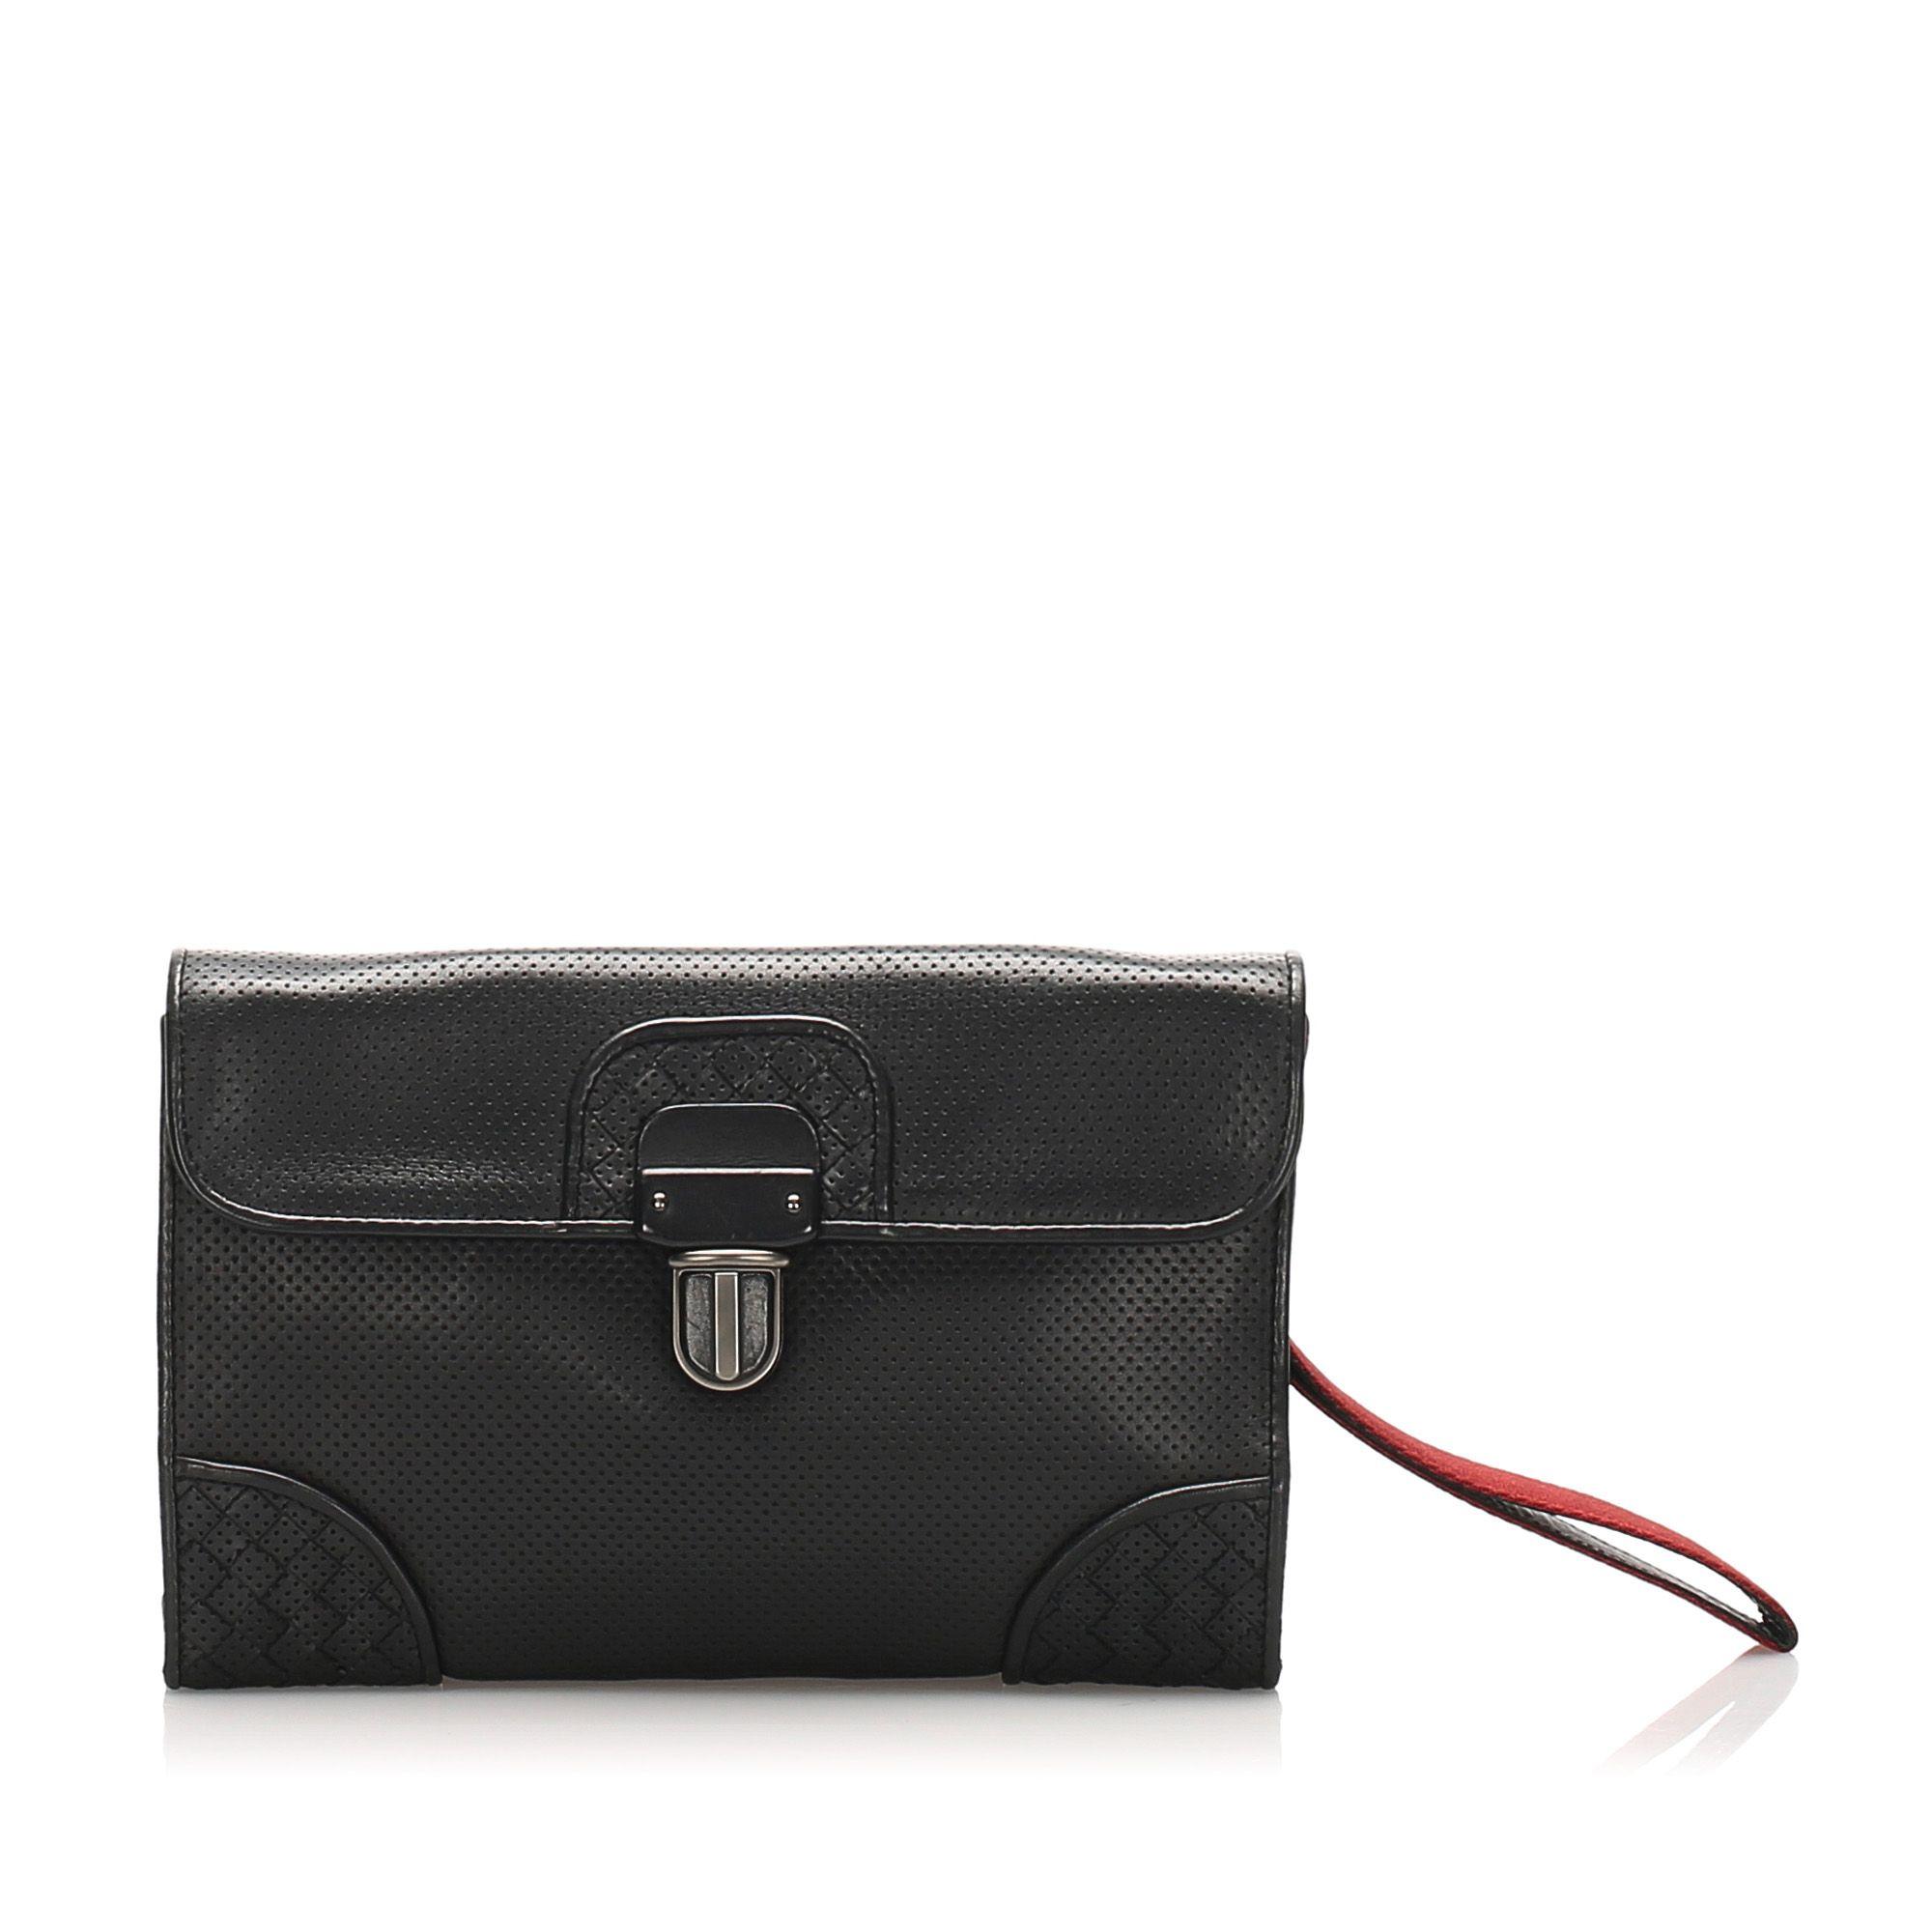 Vintage Bottega Veneta Intrecciato Perforated Leather Clutch Bag Black